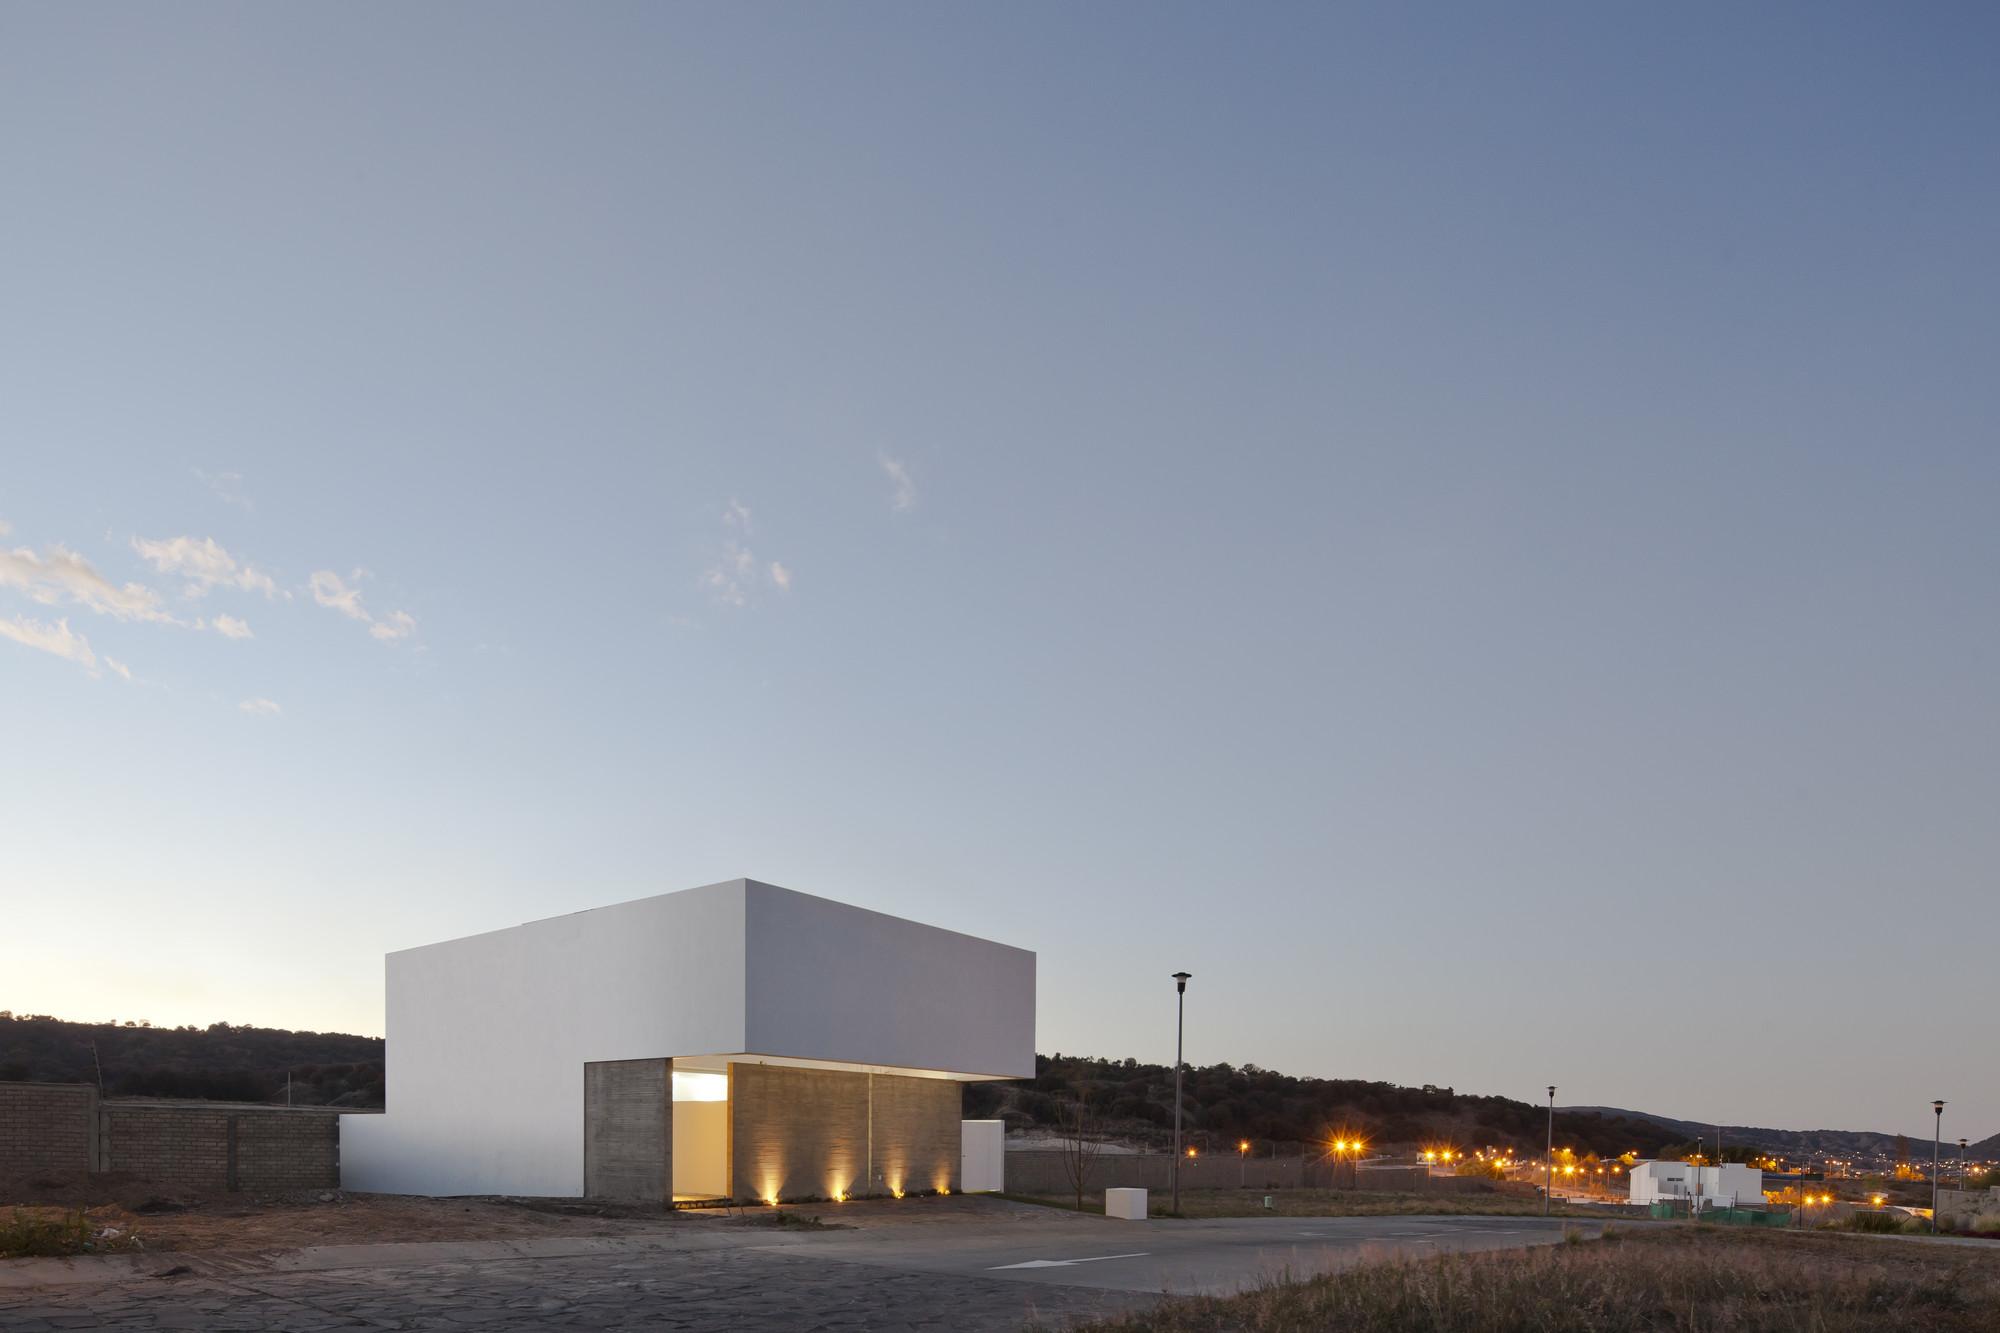 Casa para ver al cielo / Abraham Cota Paredes Arquitectos, © Onnis Luque